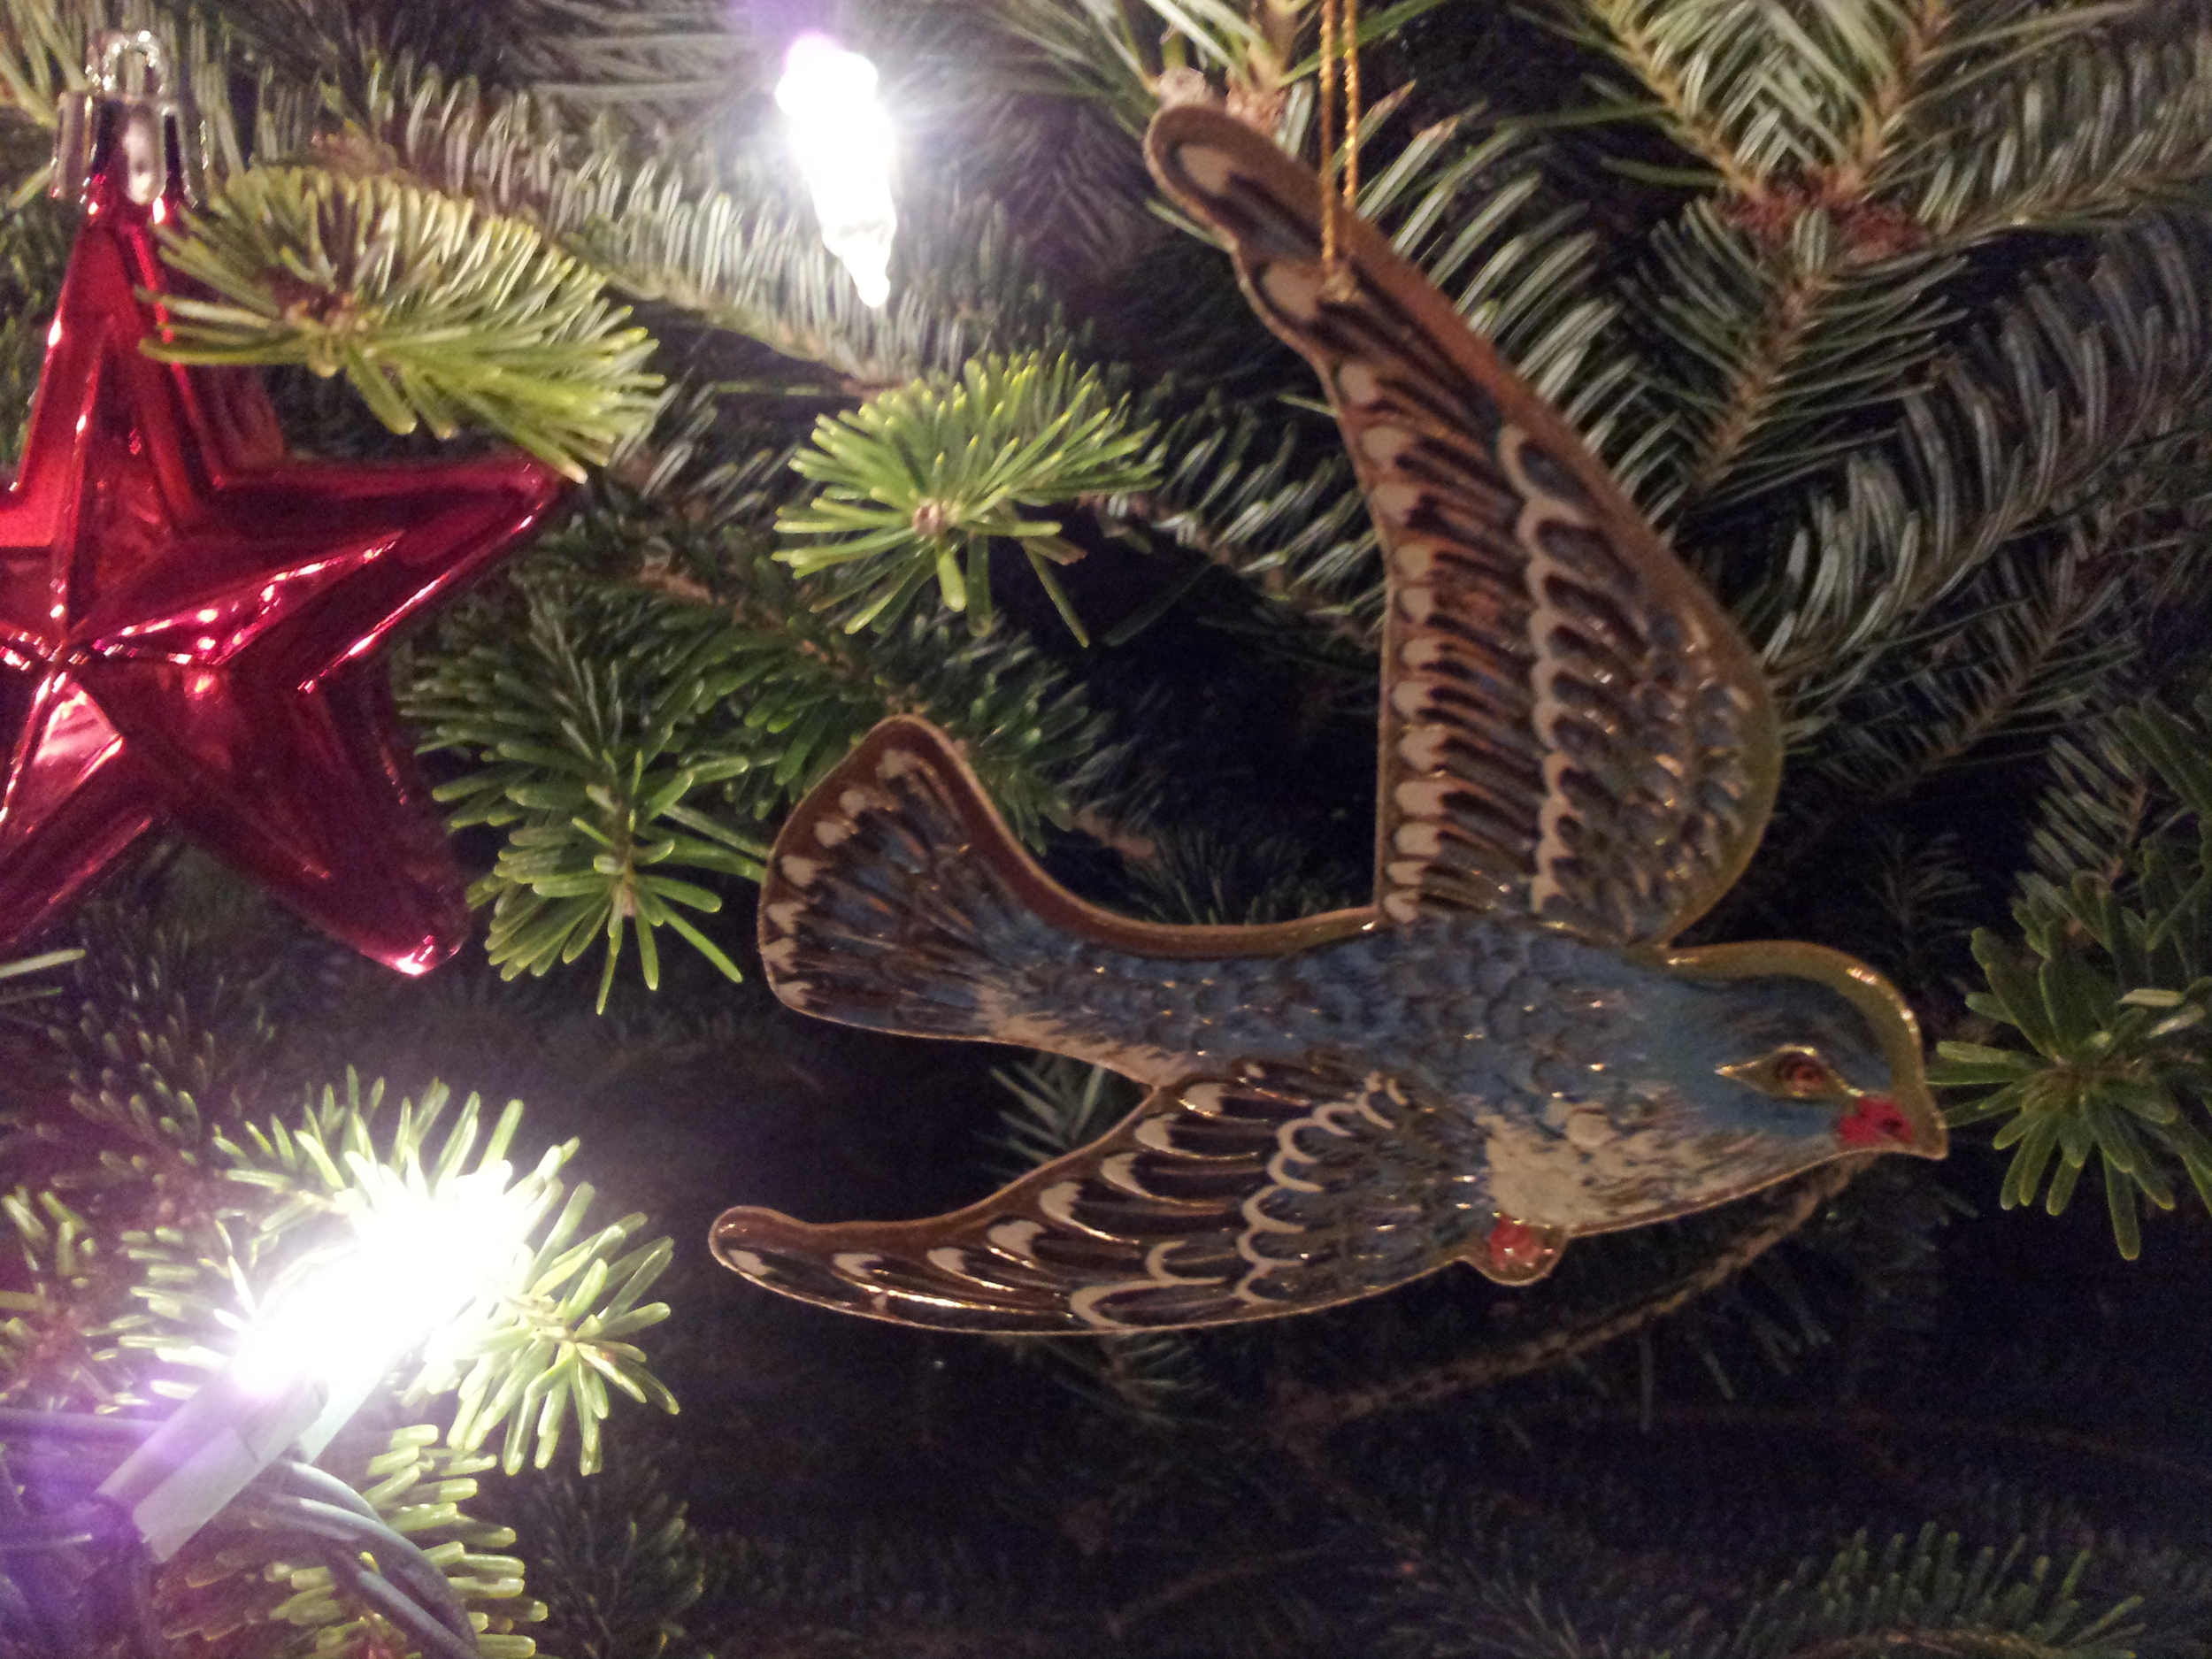 Golden bird on the Inn at West View Farm Tree